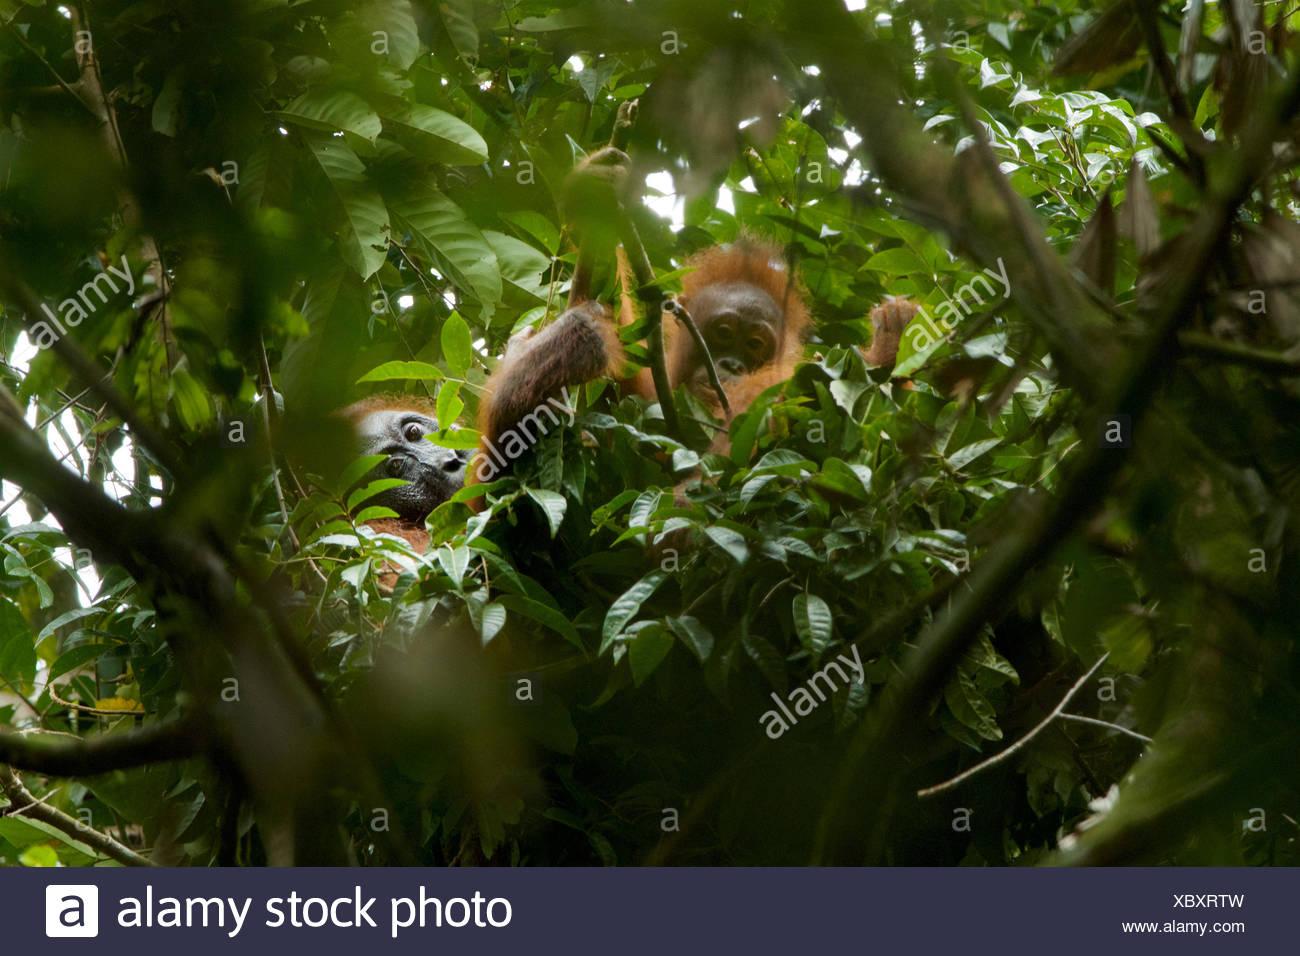 An adult female Bornean orangutan, Pongo pygmaeus wurmbii, and juvenile rest in a tree in Gunung Palung National Park. - Stock Image